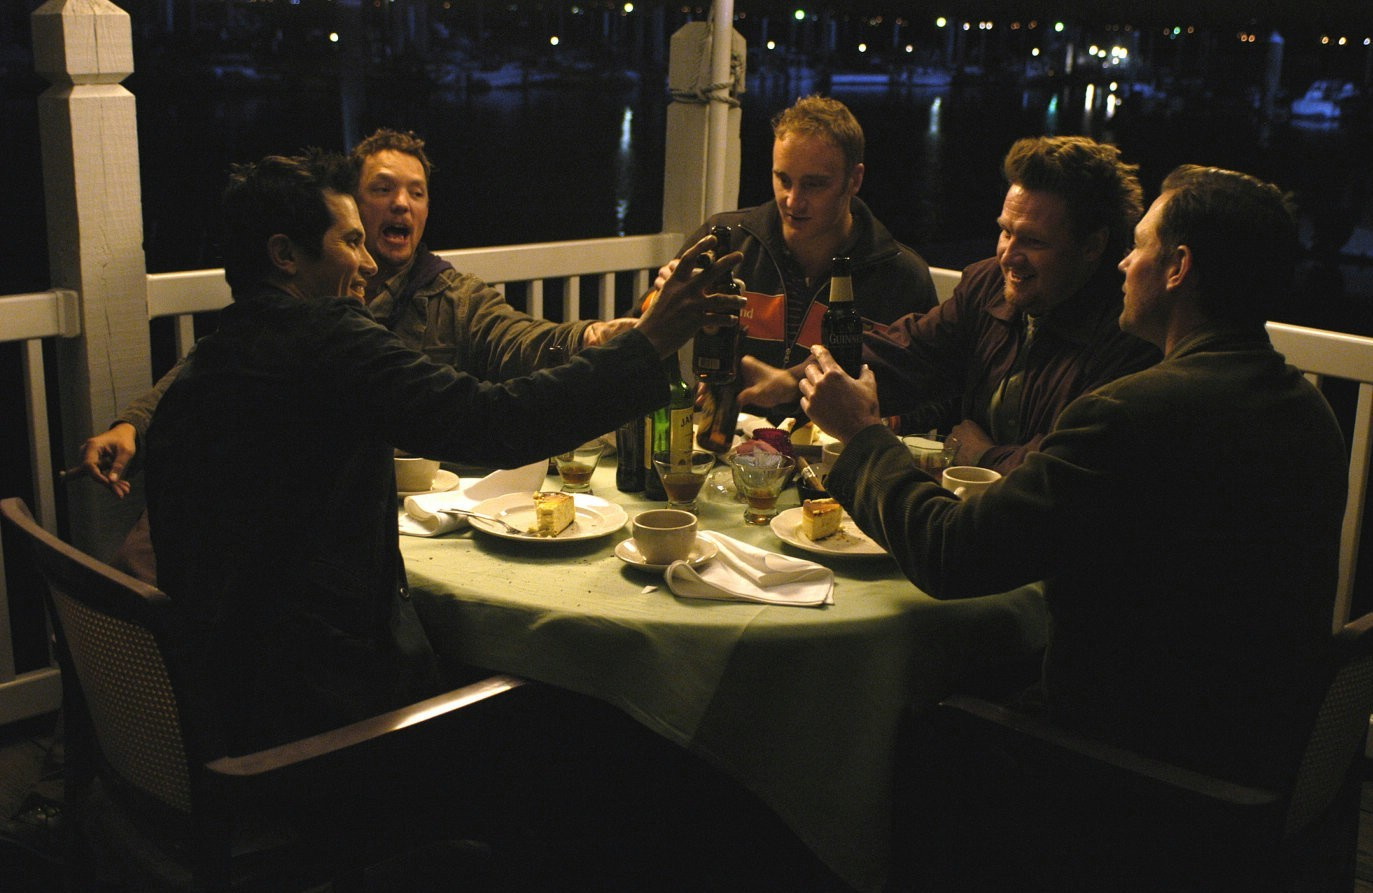 Jay Mohr,John Leguizamo,Matthew Lillard